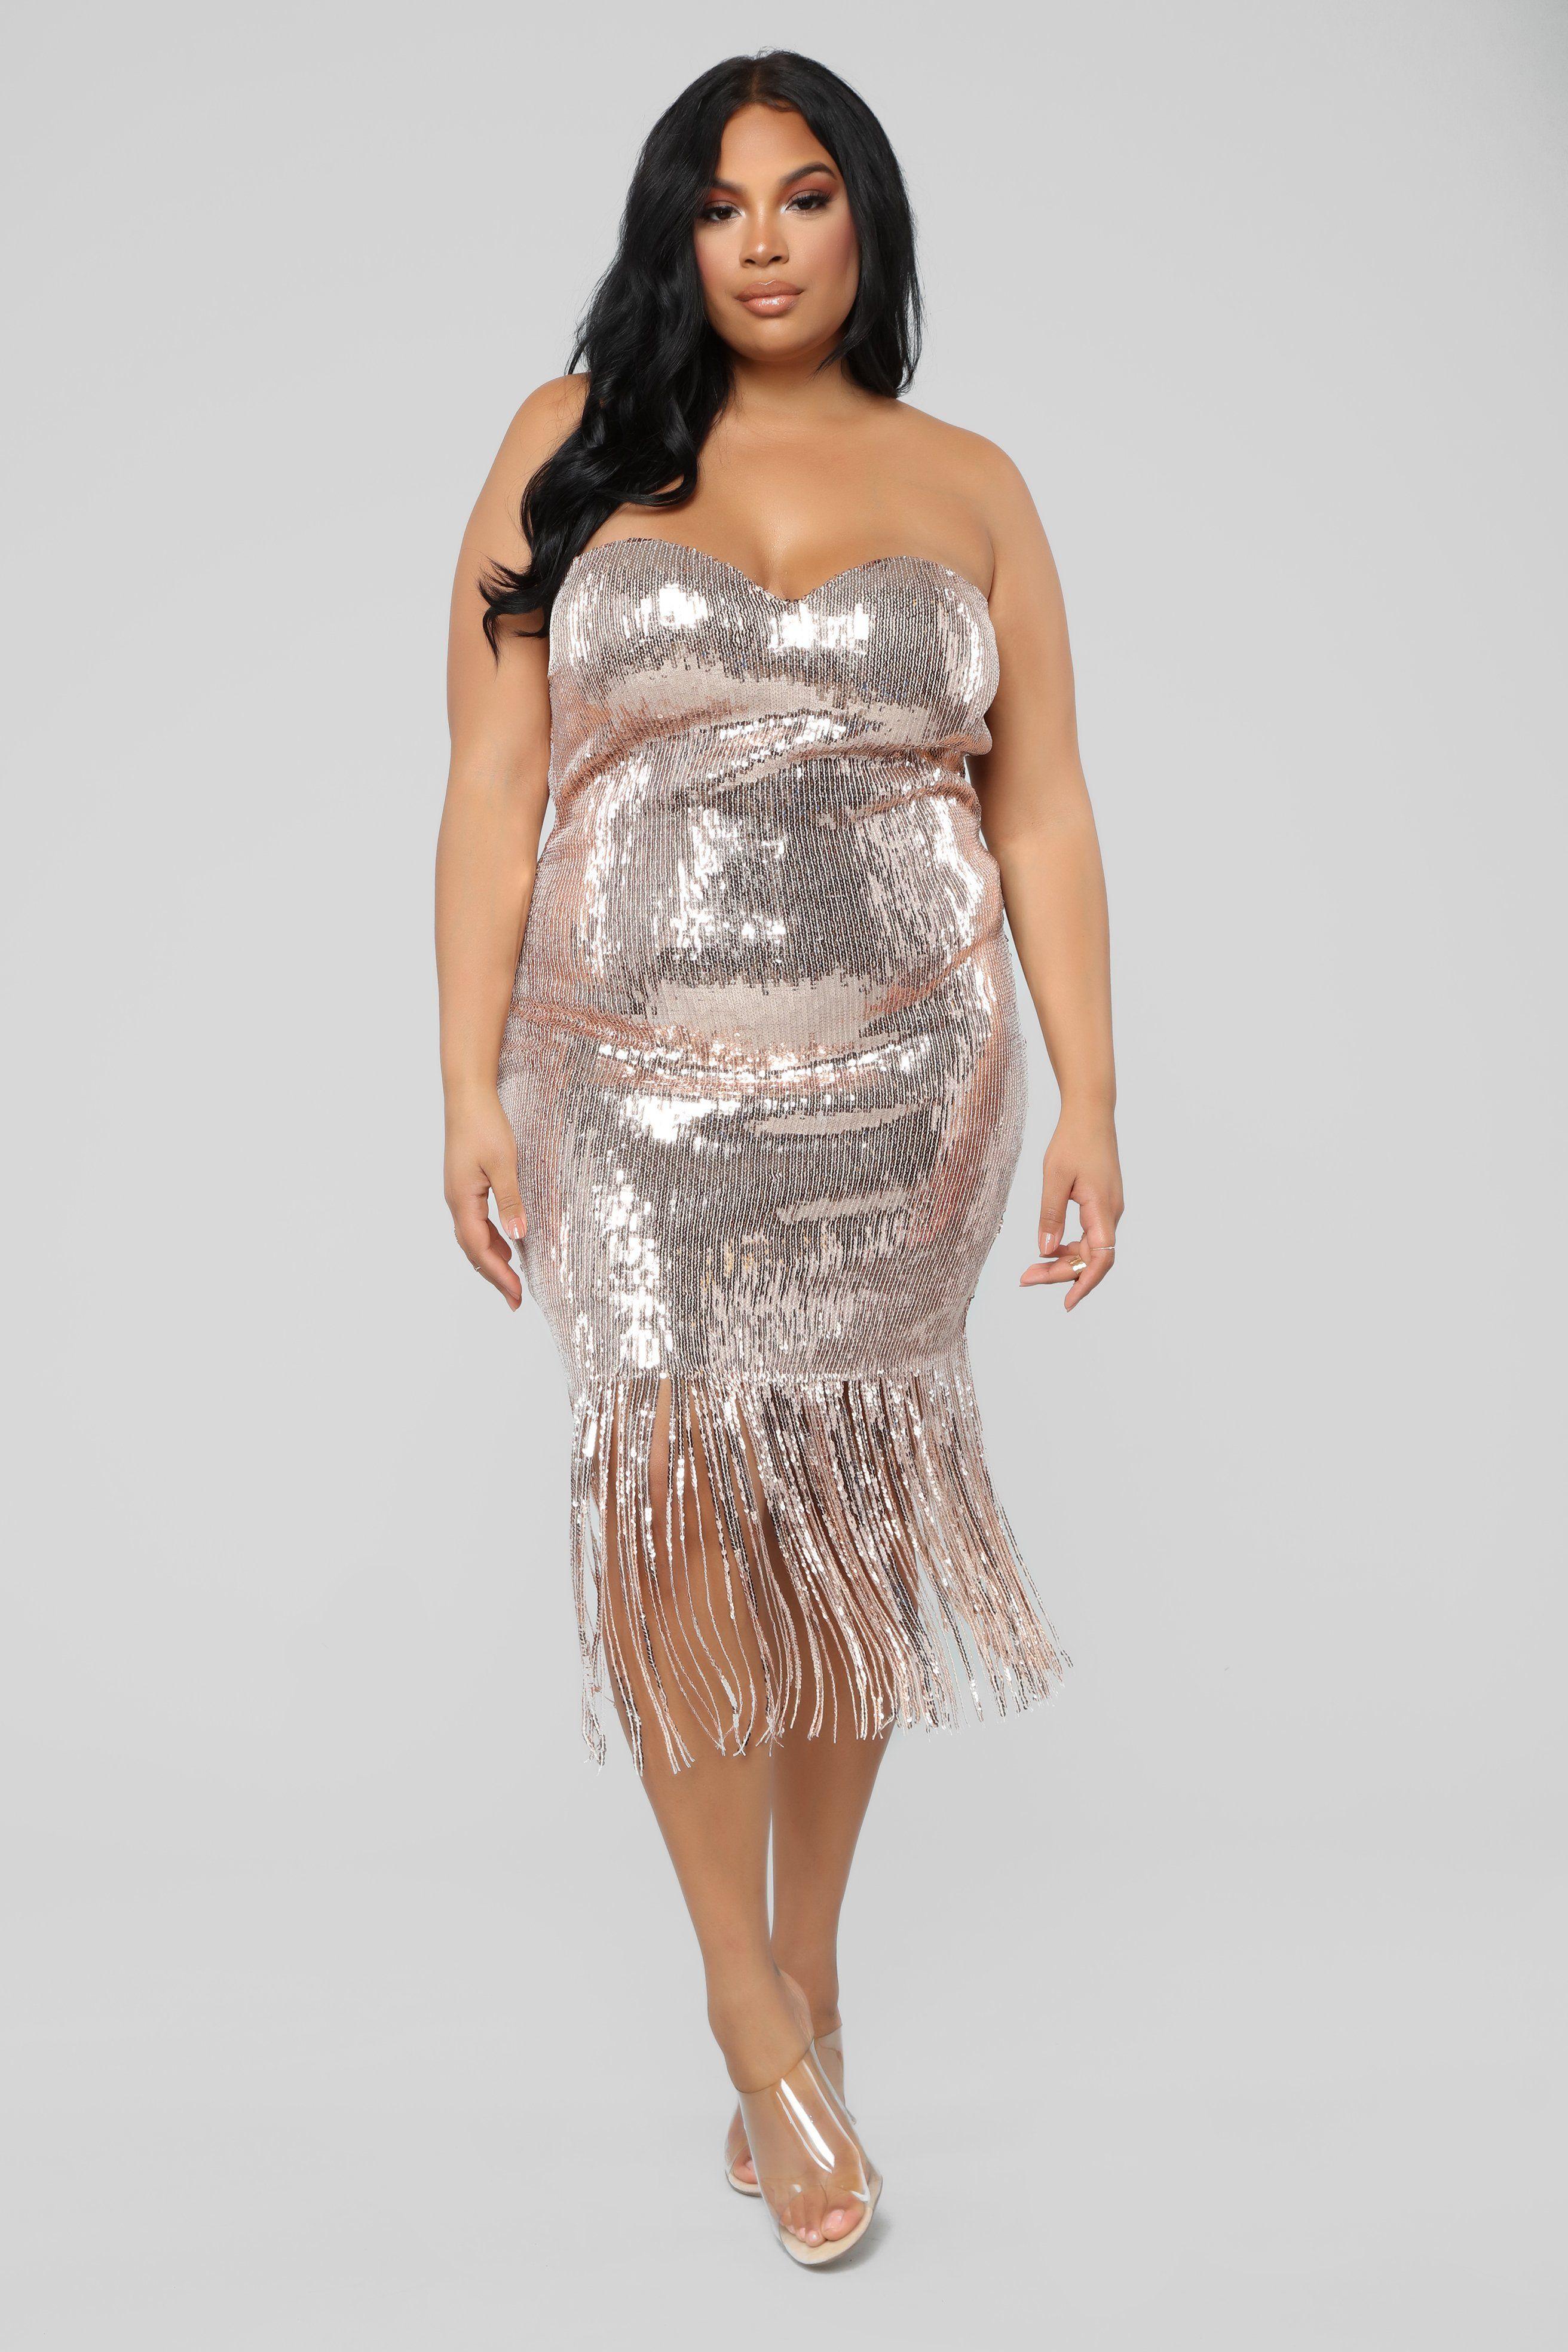 c2f88907b02b Inexpensive Wedding Invitations, Wedding Invitations Online, Sexy Evening  Dress, Wedding Guest Style,